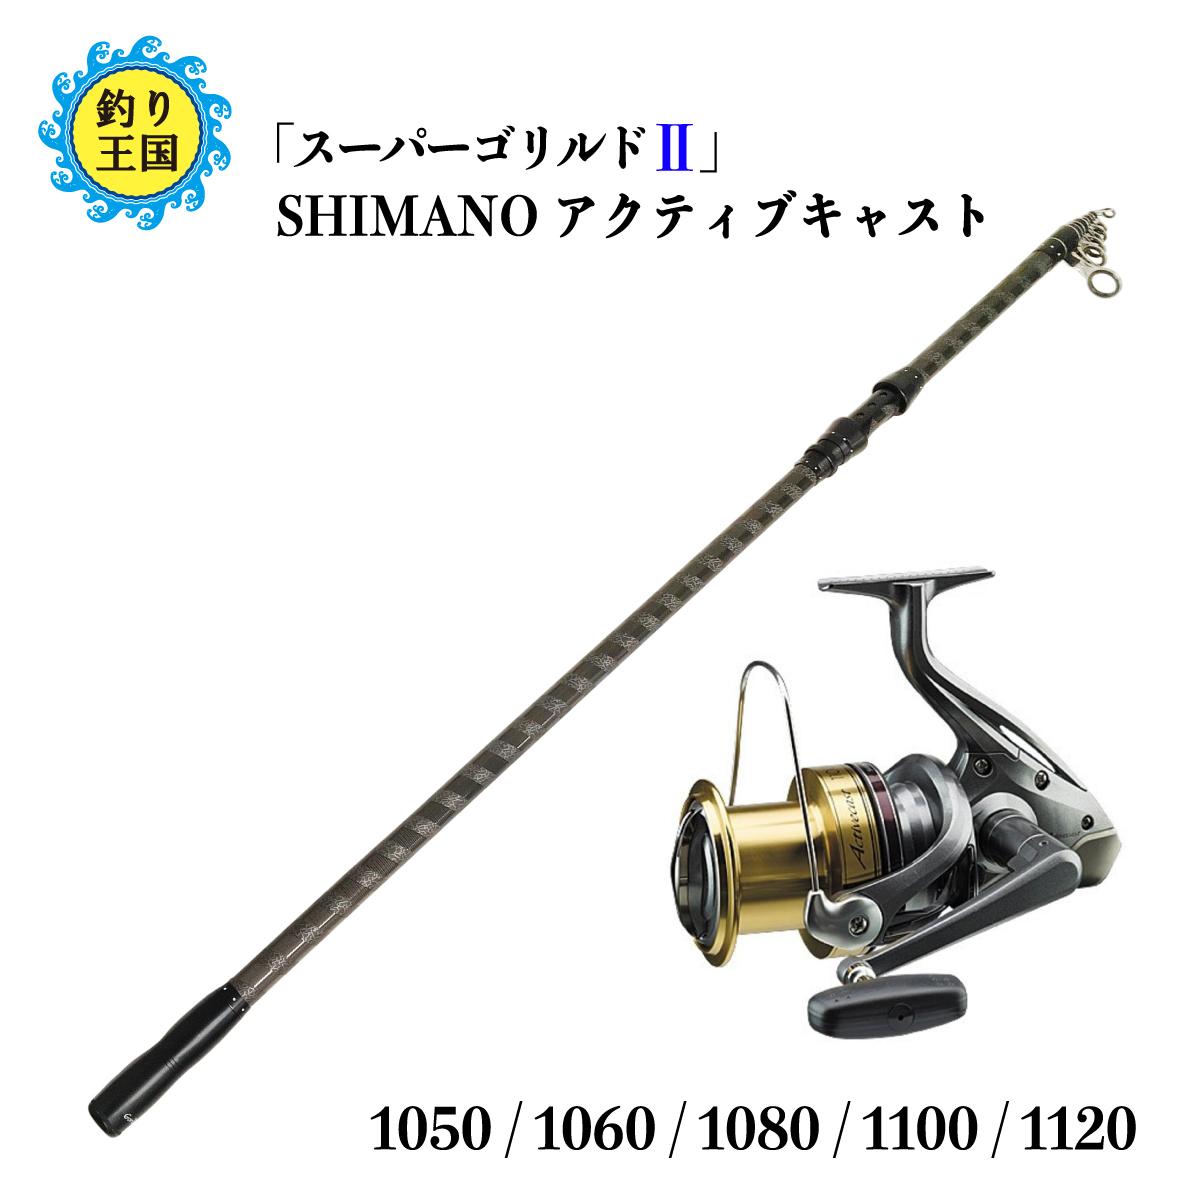 SHIMANO シマノ アクティブキャスト 1100 スピニングリール オルルド釣具 スーパーゴリルドII 振出式 4.25m セット